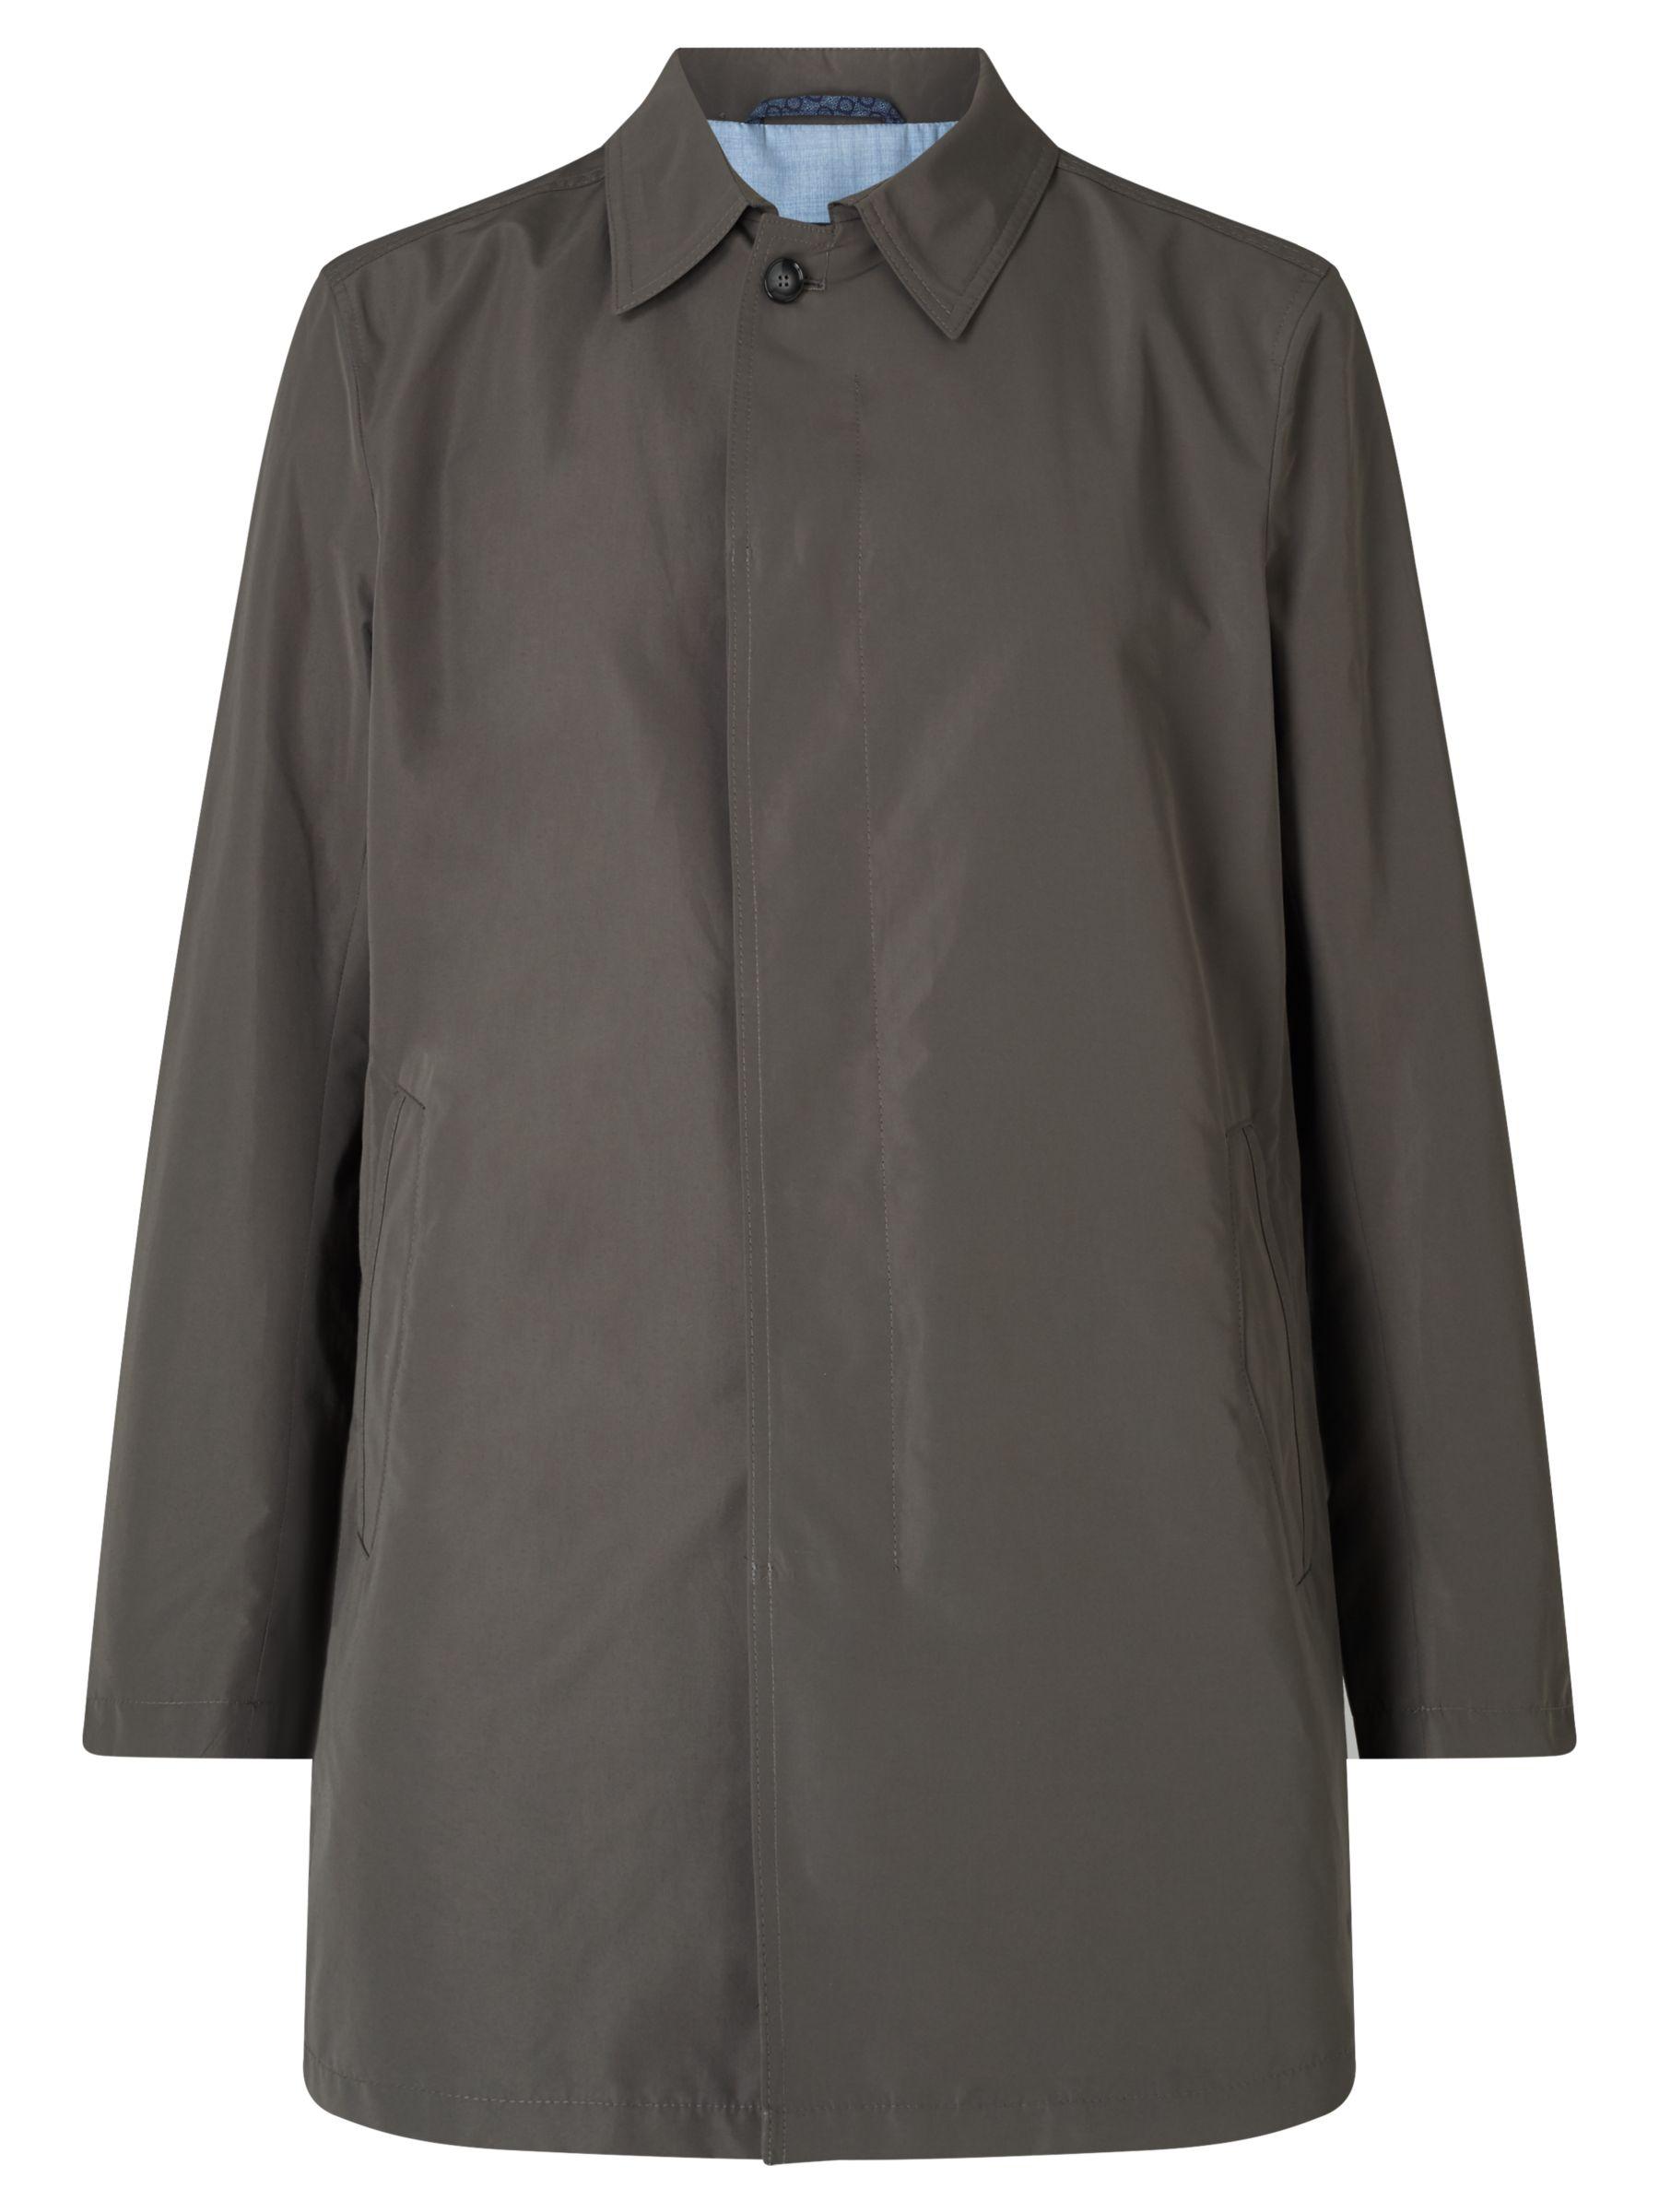 Bugatti Bugatti 84cm Slim Shirt Collar Mac, Khaki